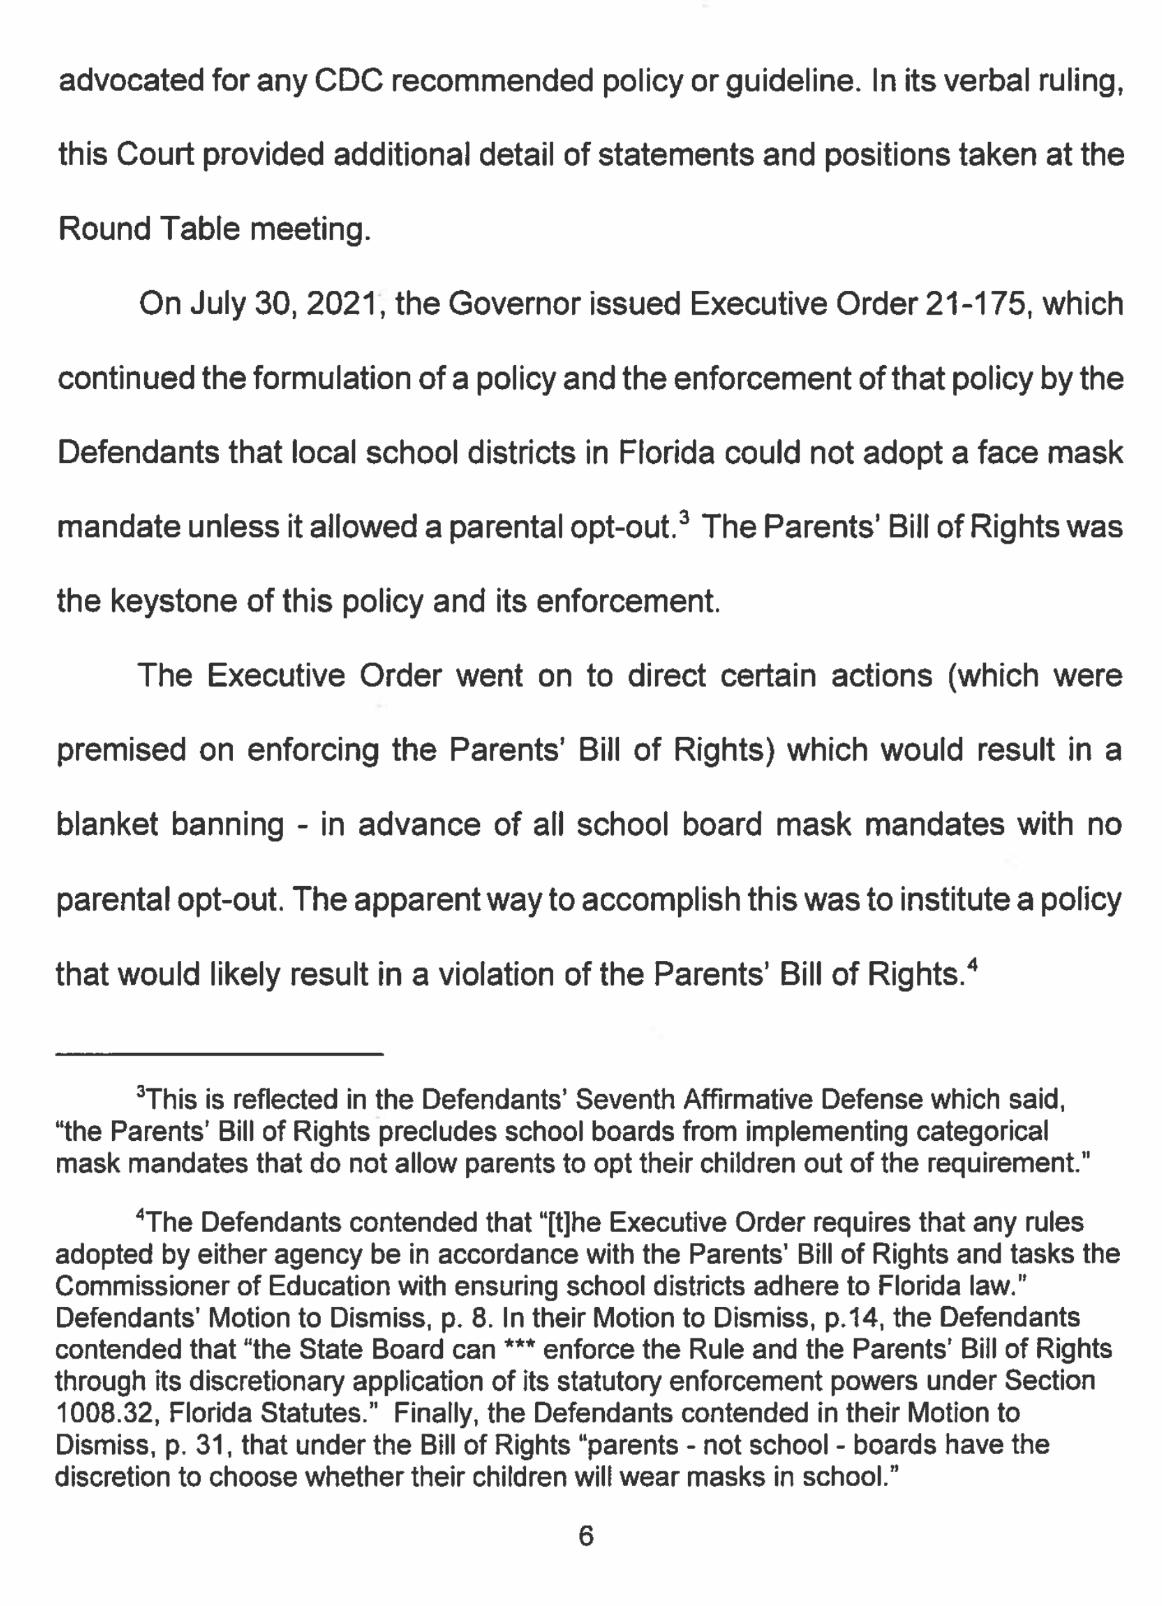 Screen-Shot-2021-09-08-at-1.12.48-PM Florida Judge Strikes Down Ron DeSantis' COVID Restrictions Coronavirus Education Featured Politics Top Stories